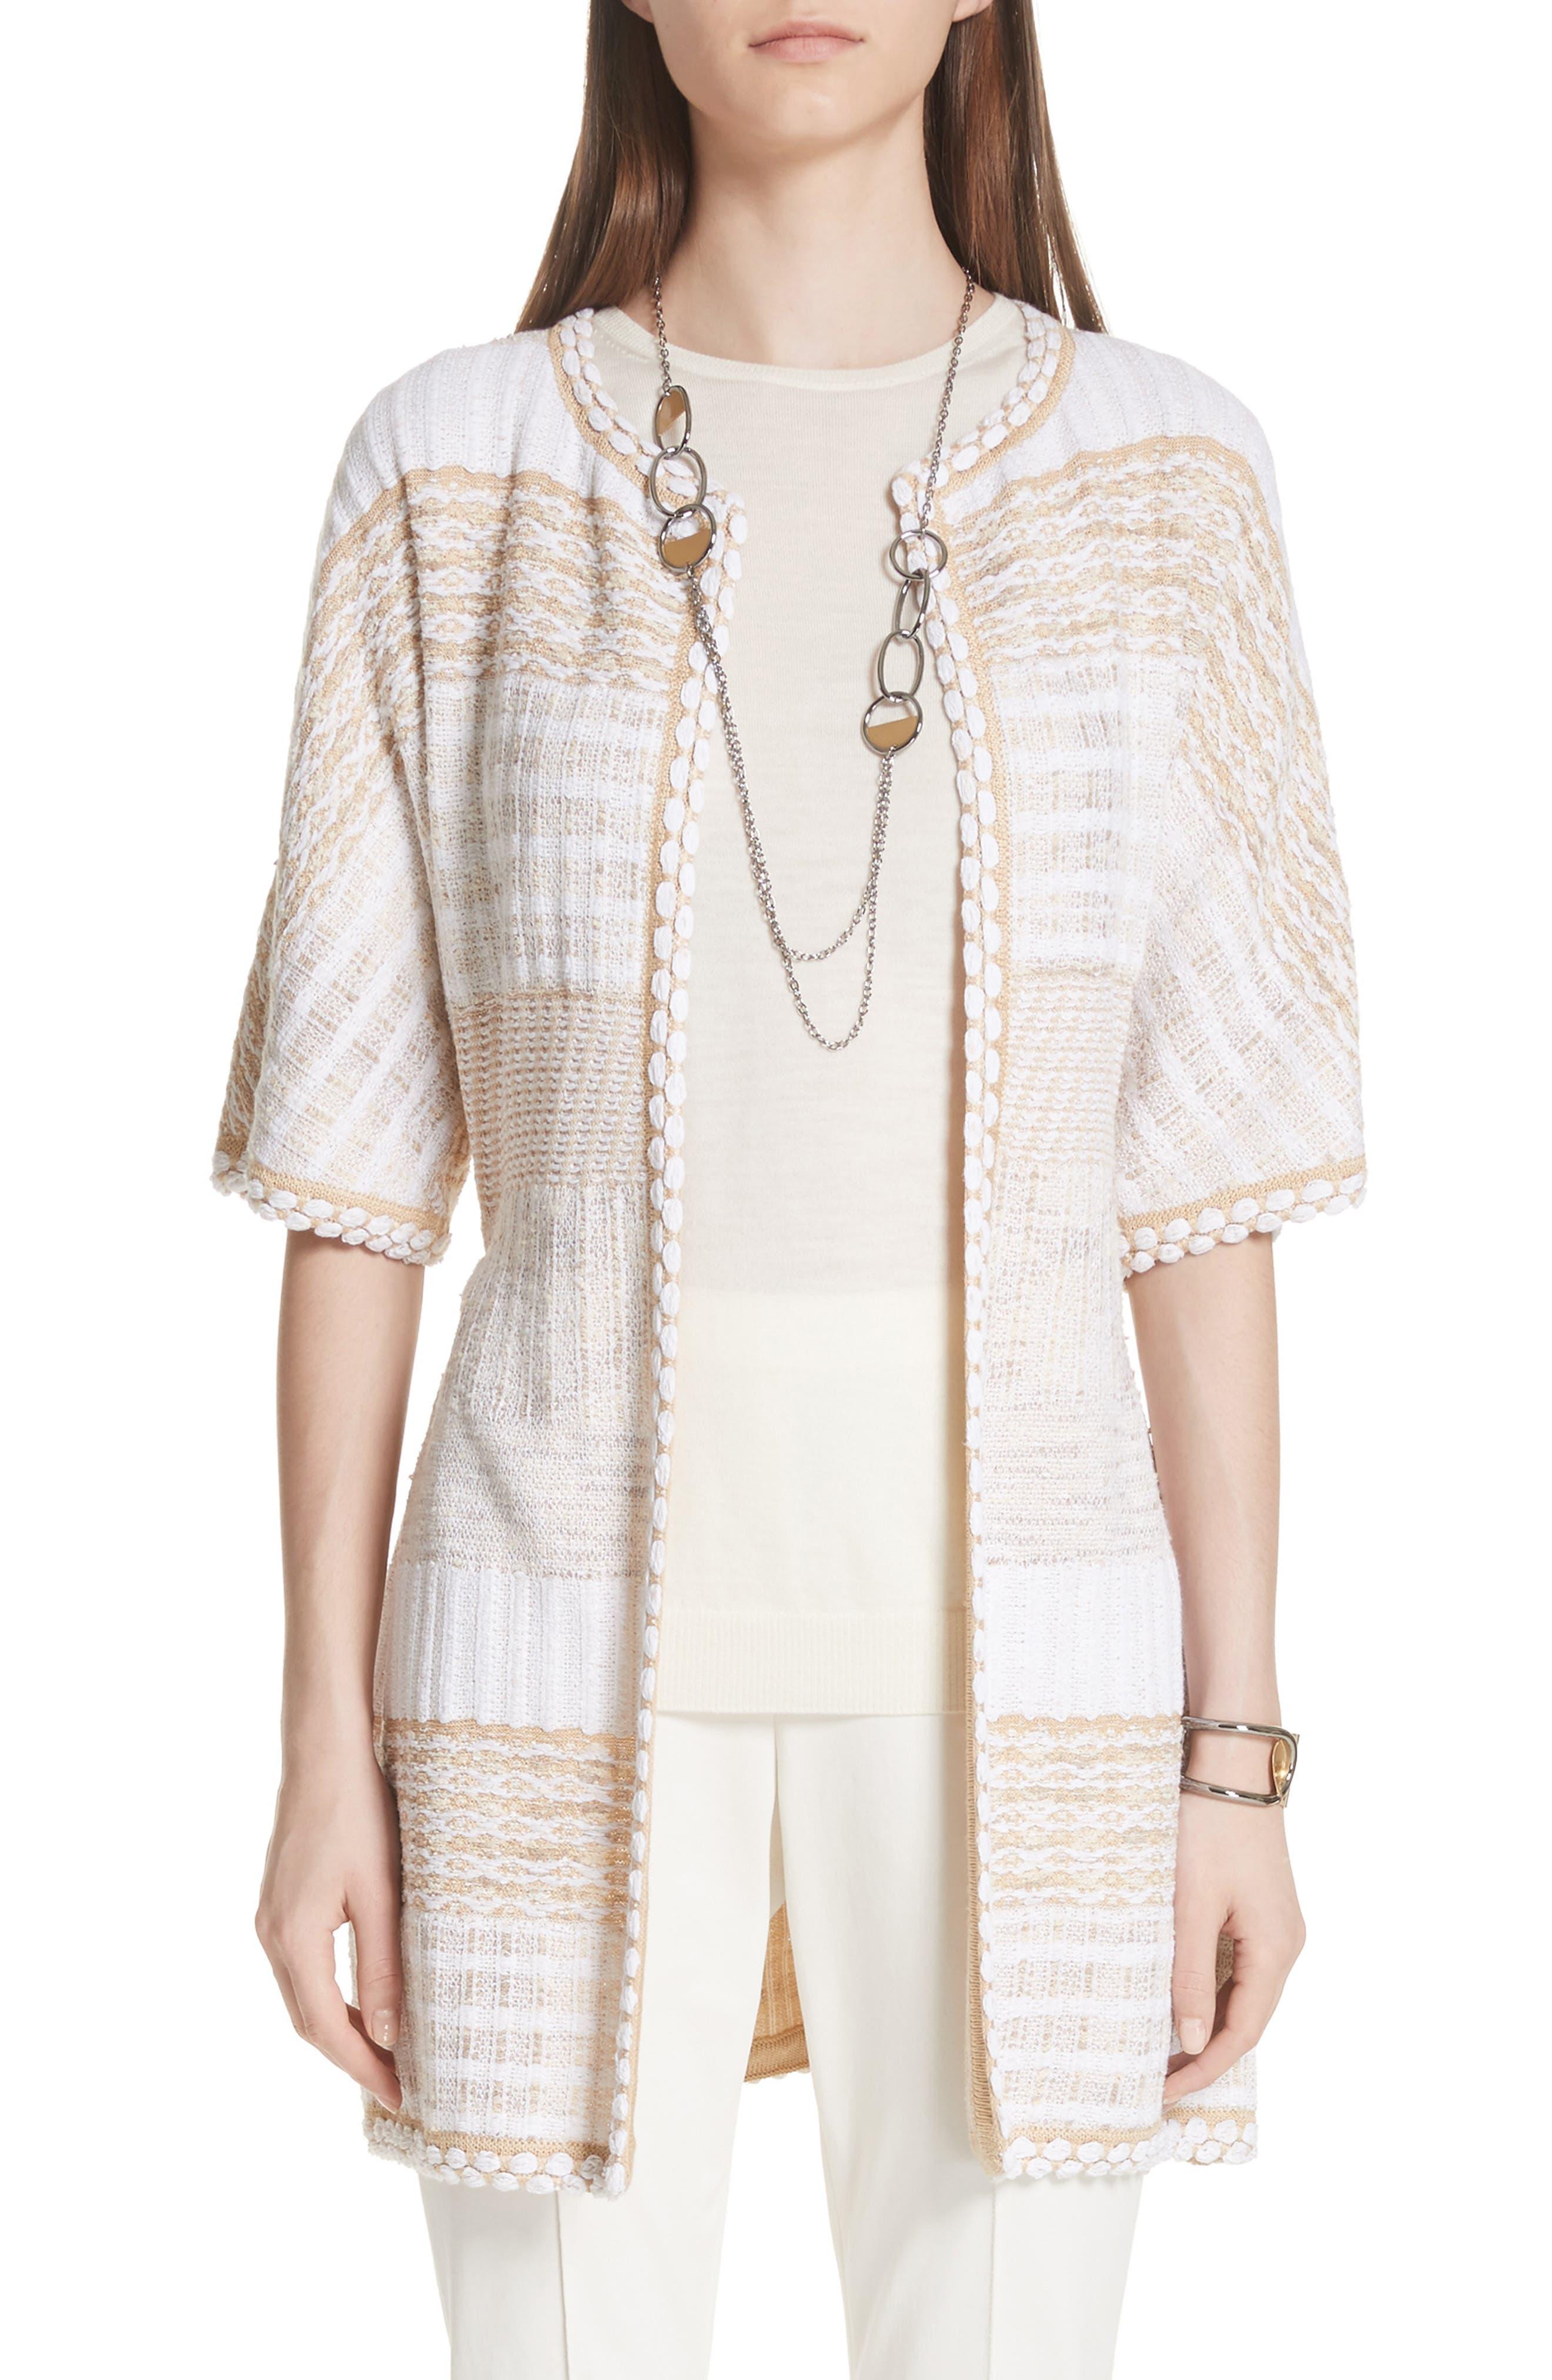 ST. JOHN COLLECTION,                             Mixed Floats Stripe Knit Jacket,                             Main thumbnail 1, color,                             700